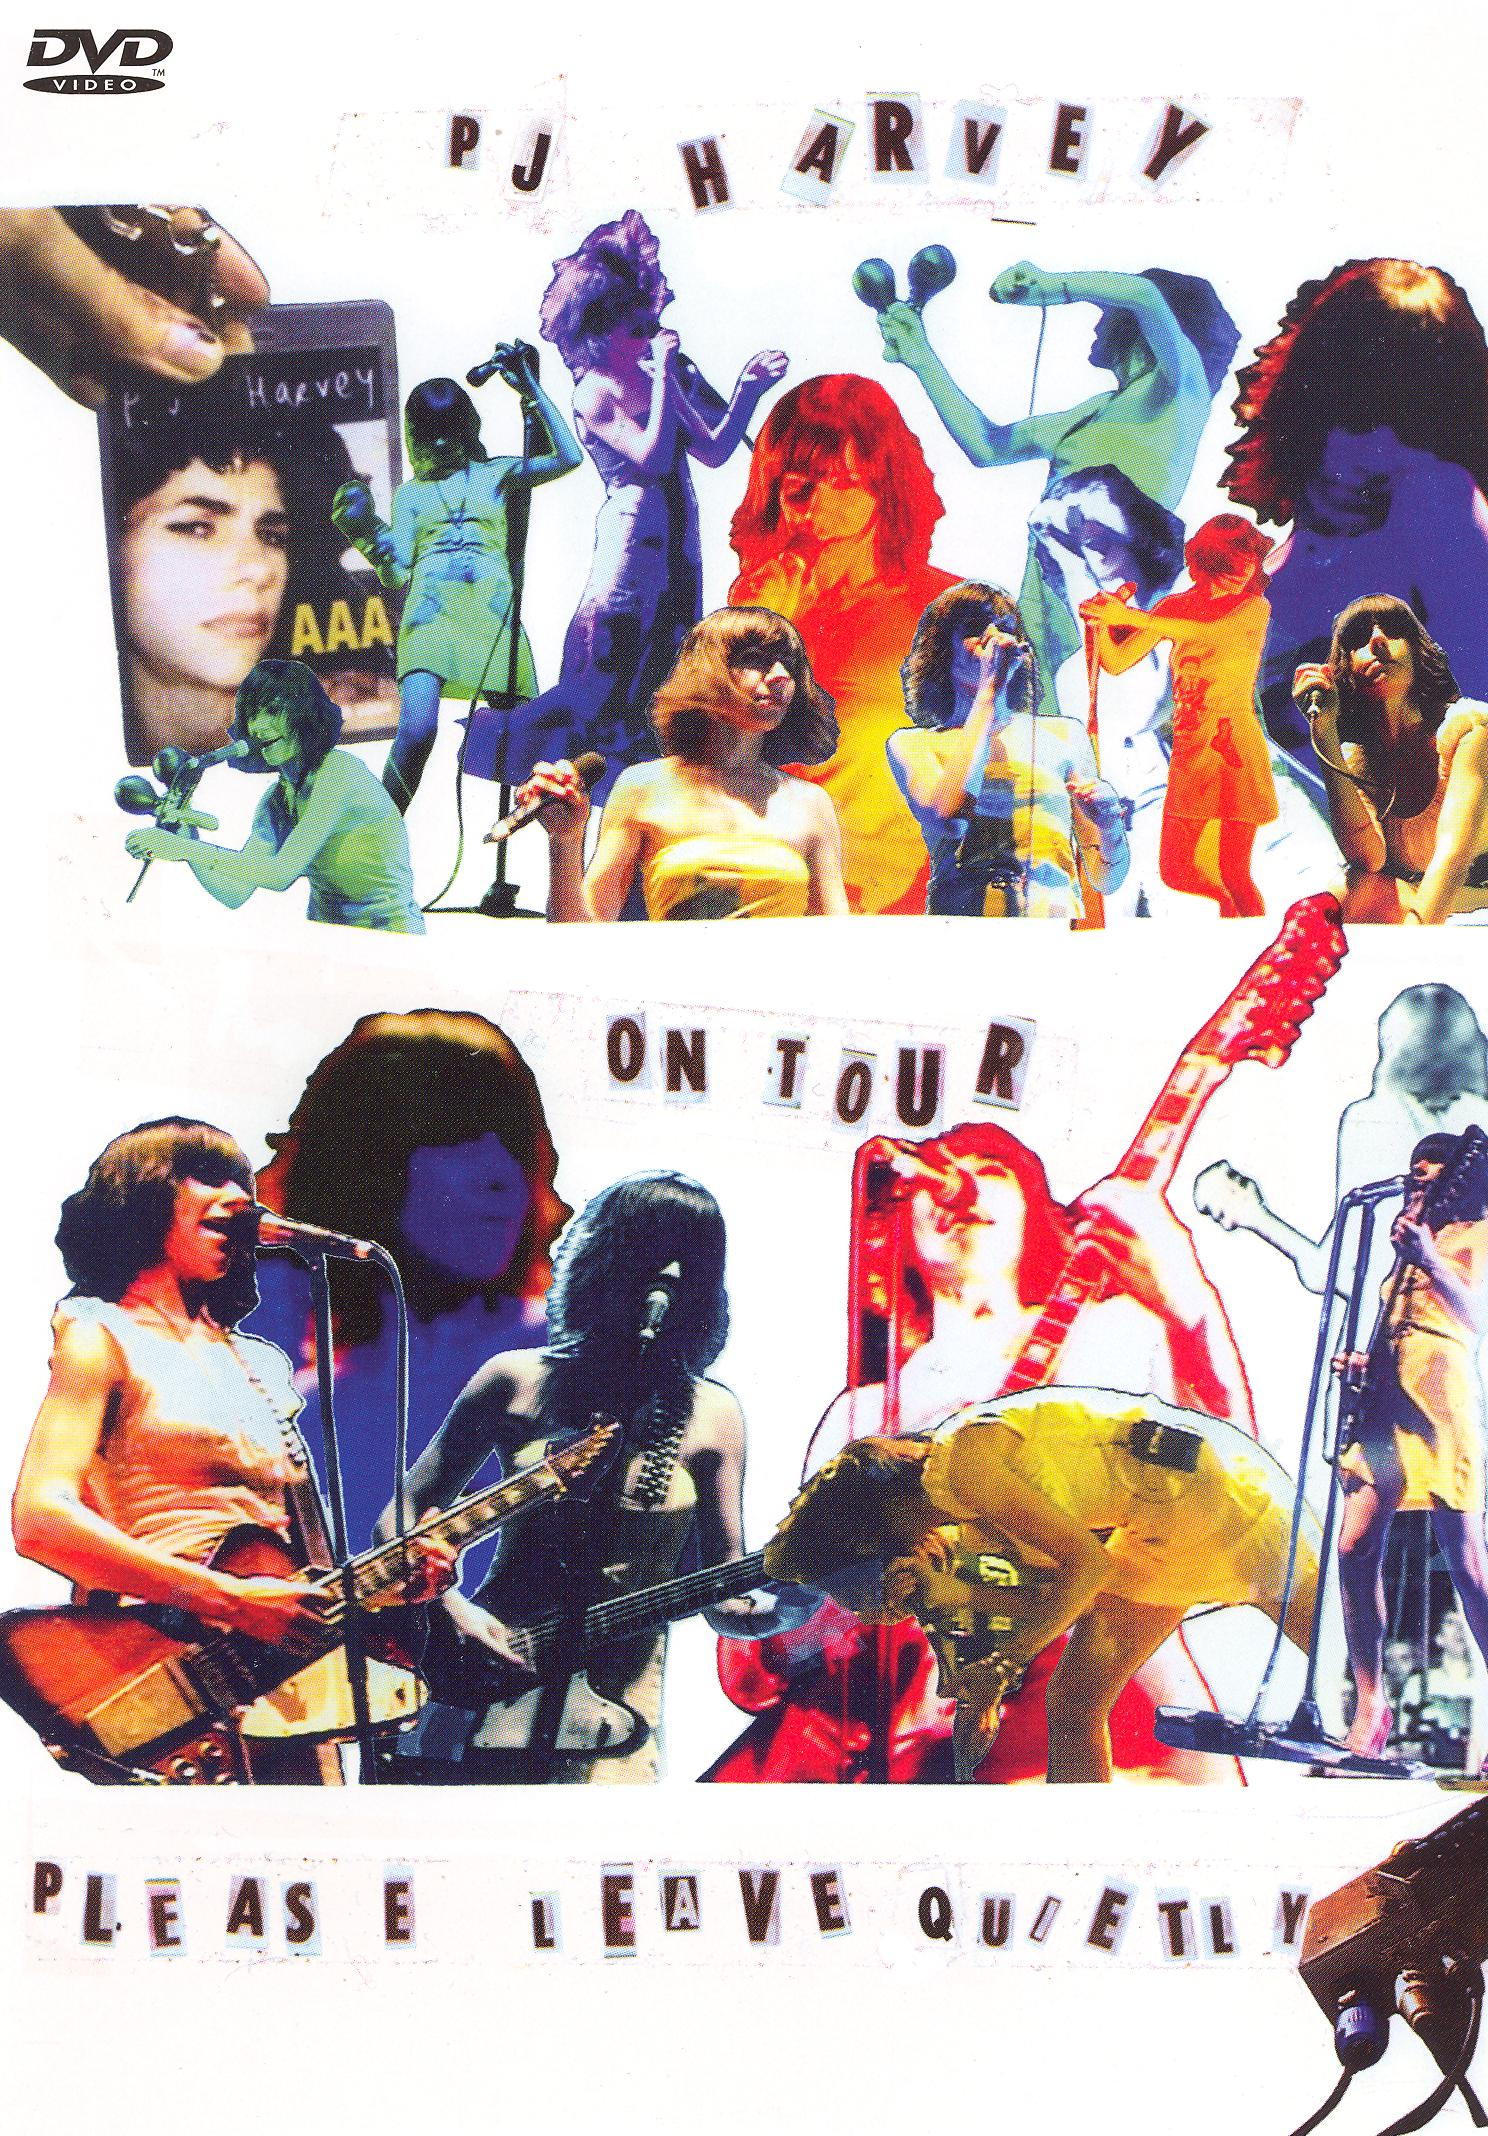 PJ Harvey: On Tour - Please Leave Quietly